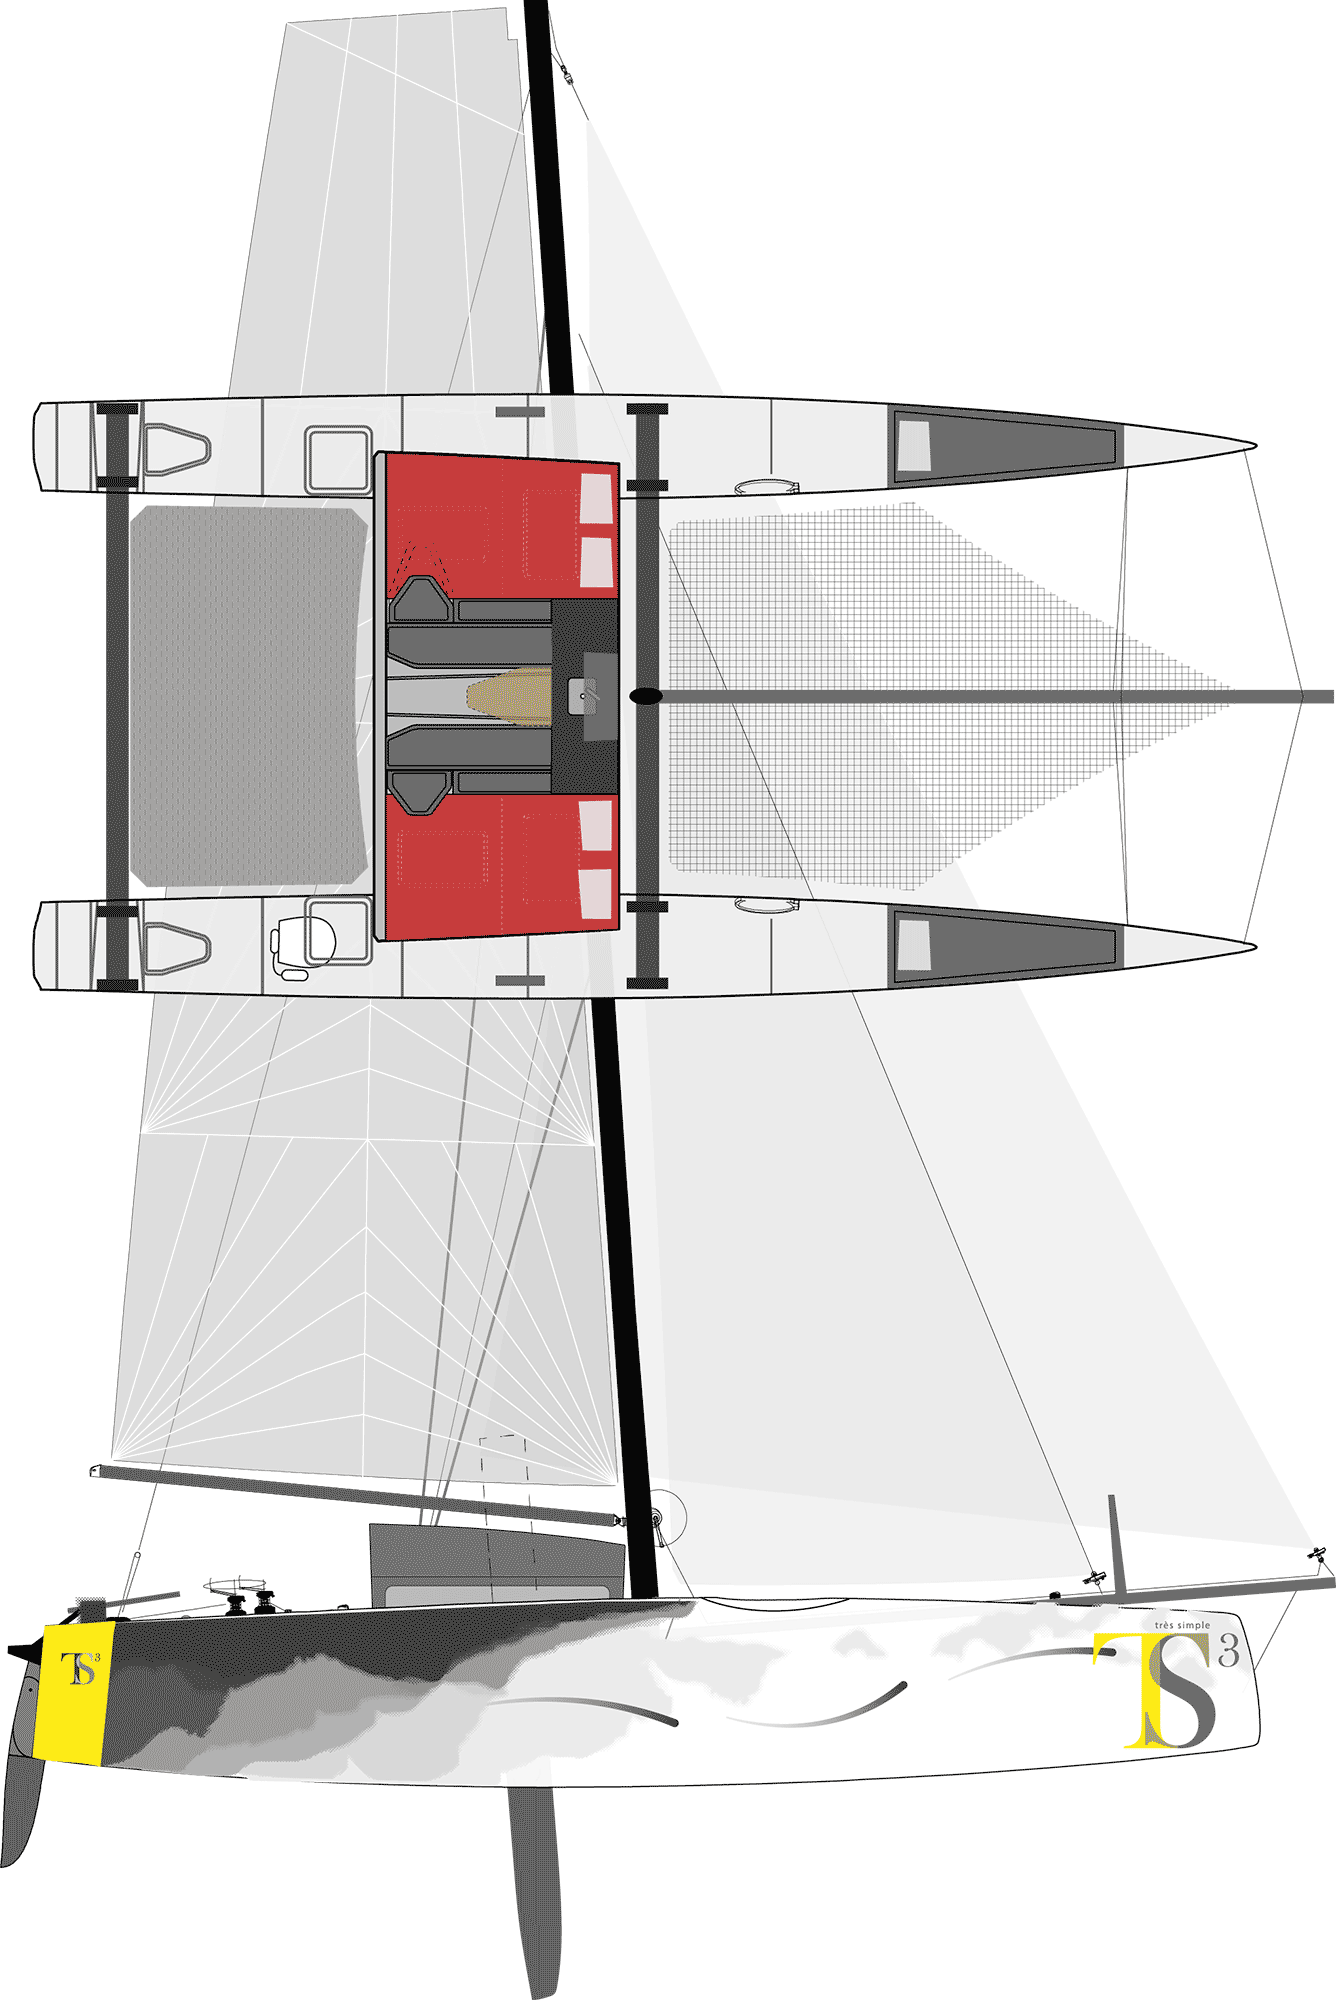 TS3 plans 2